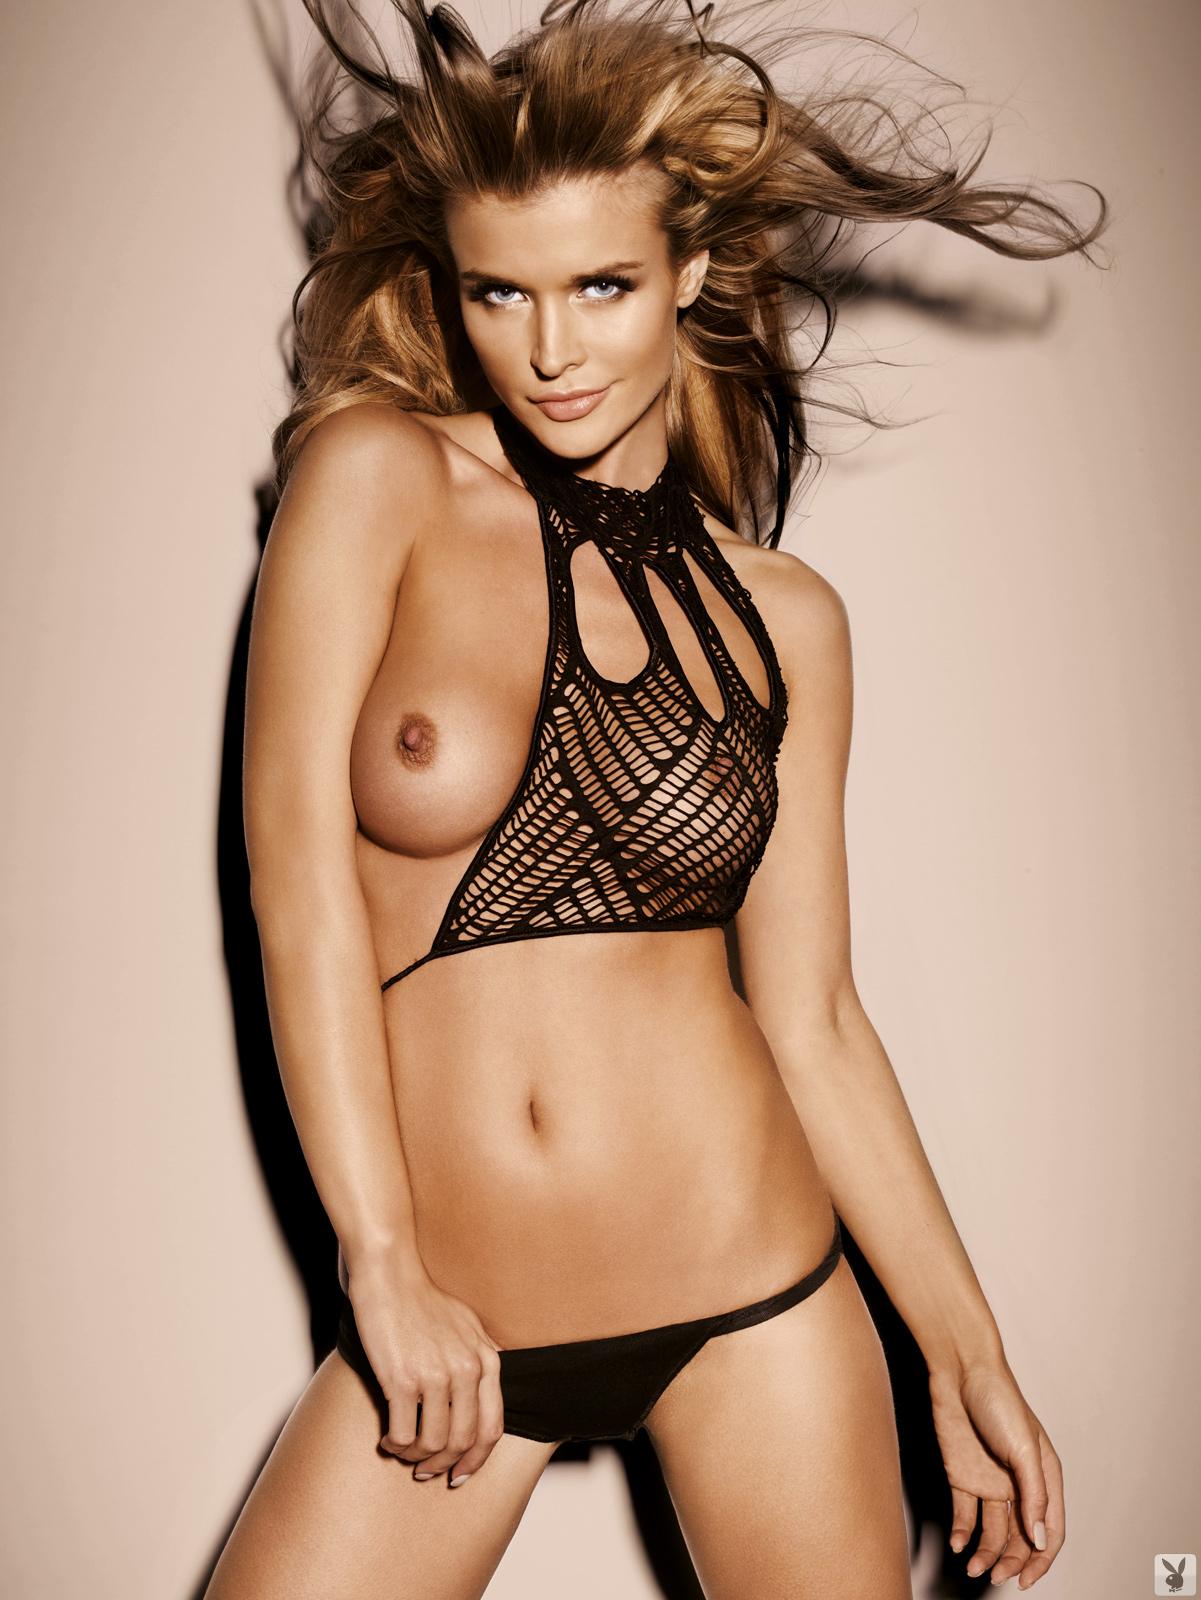 joanna krupa fully nude